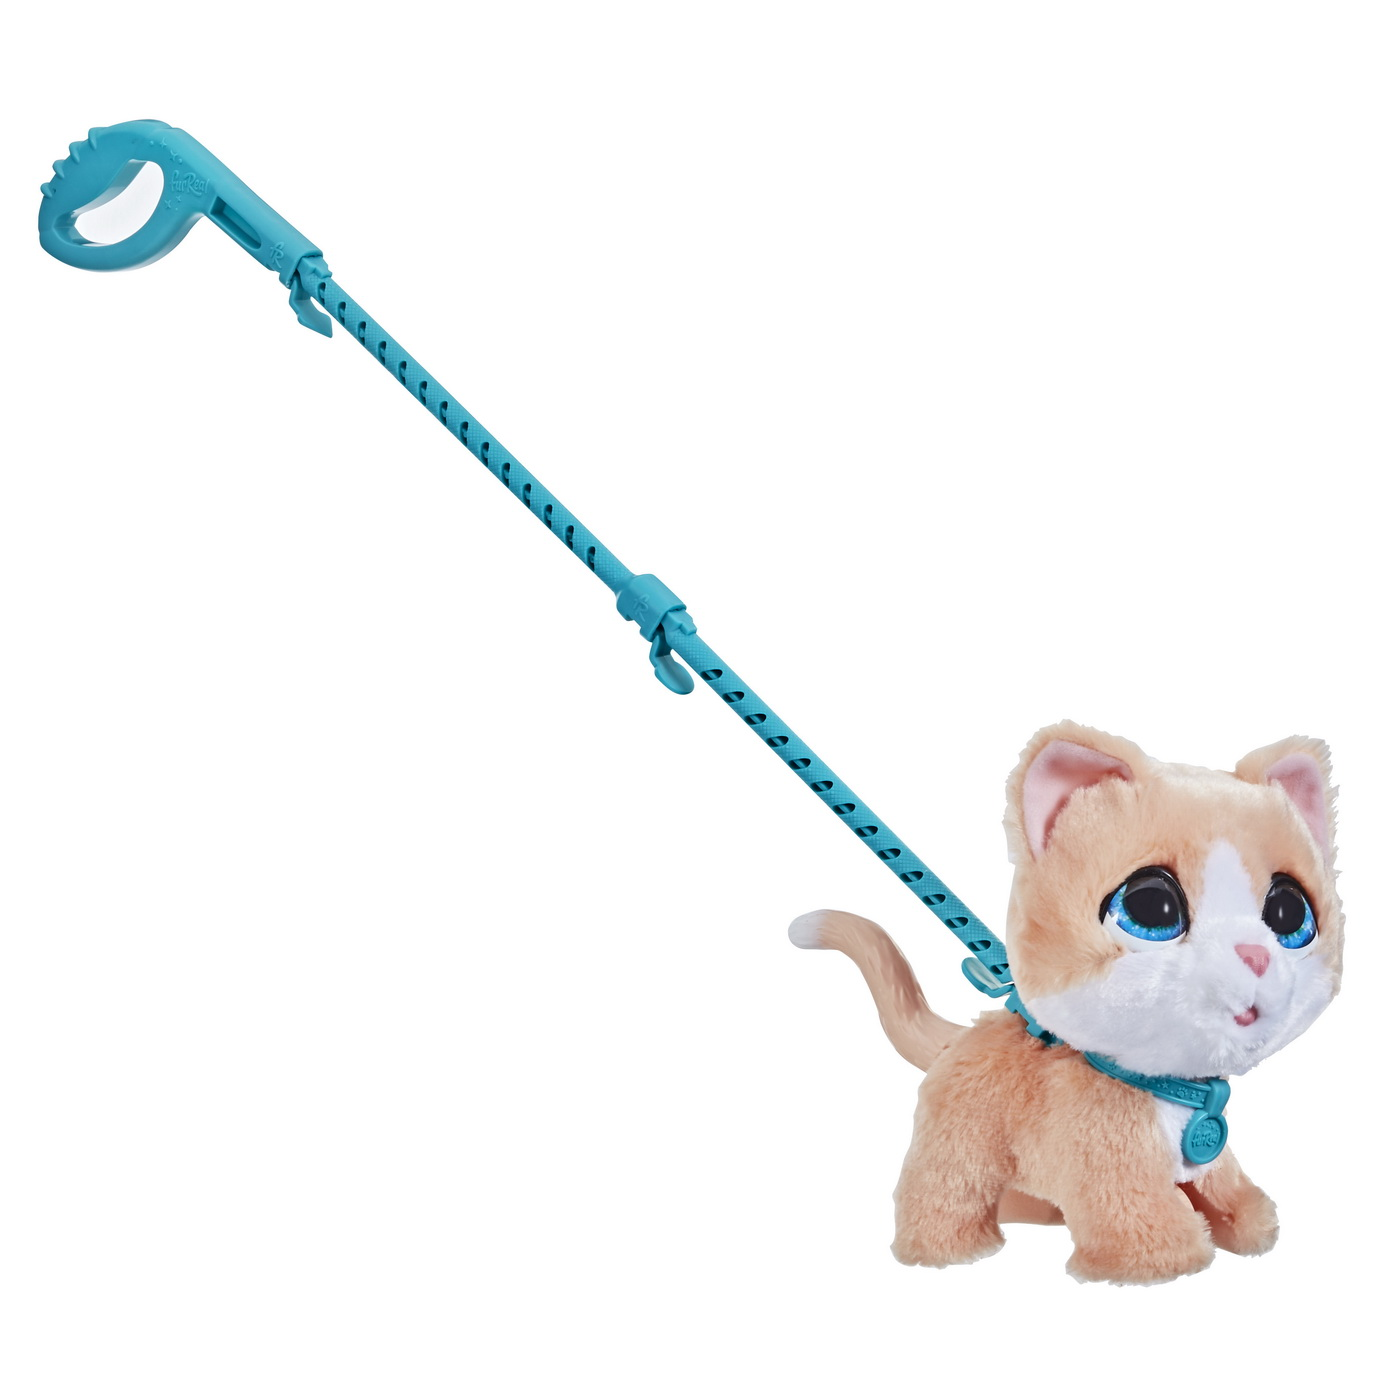 Furreal cu pisicuta la plimbare